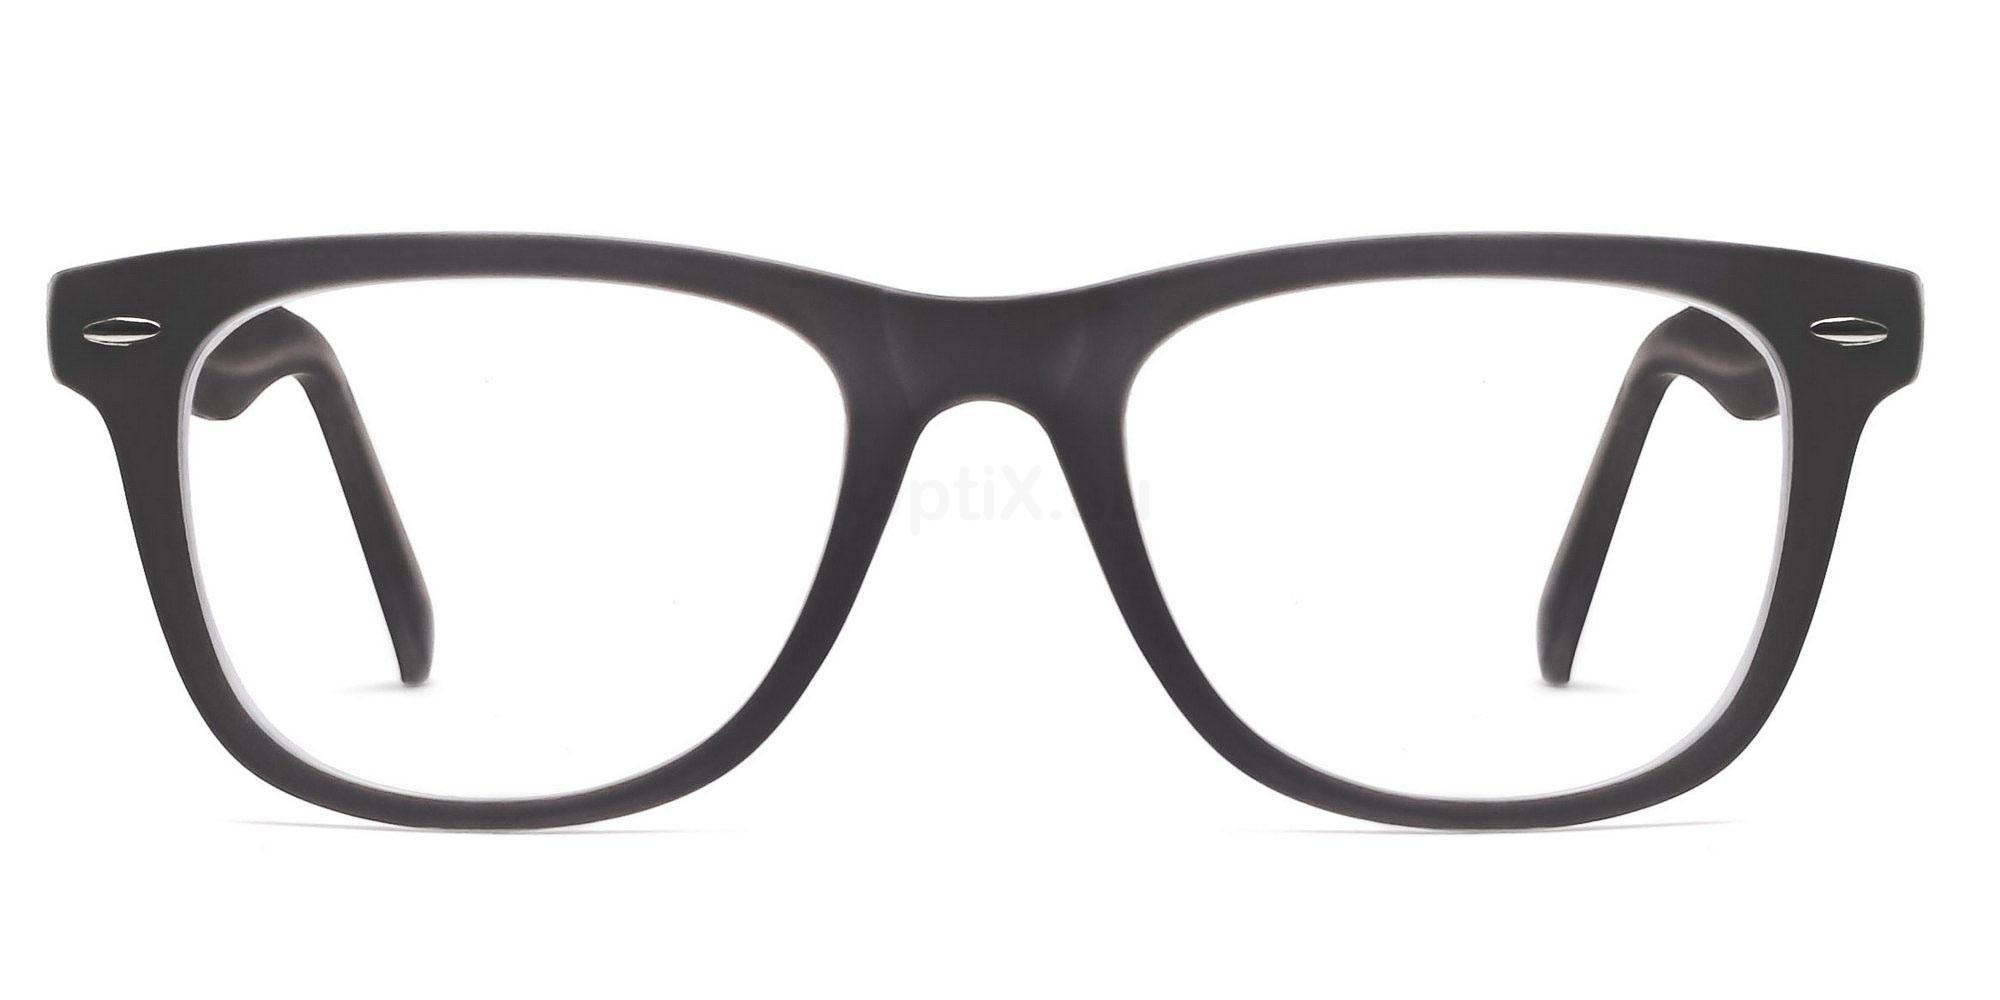 C11 8121 - Grey on Transparent Glasses, Savannah